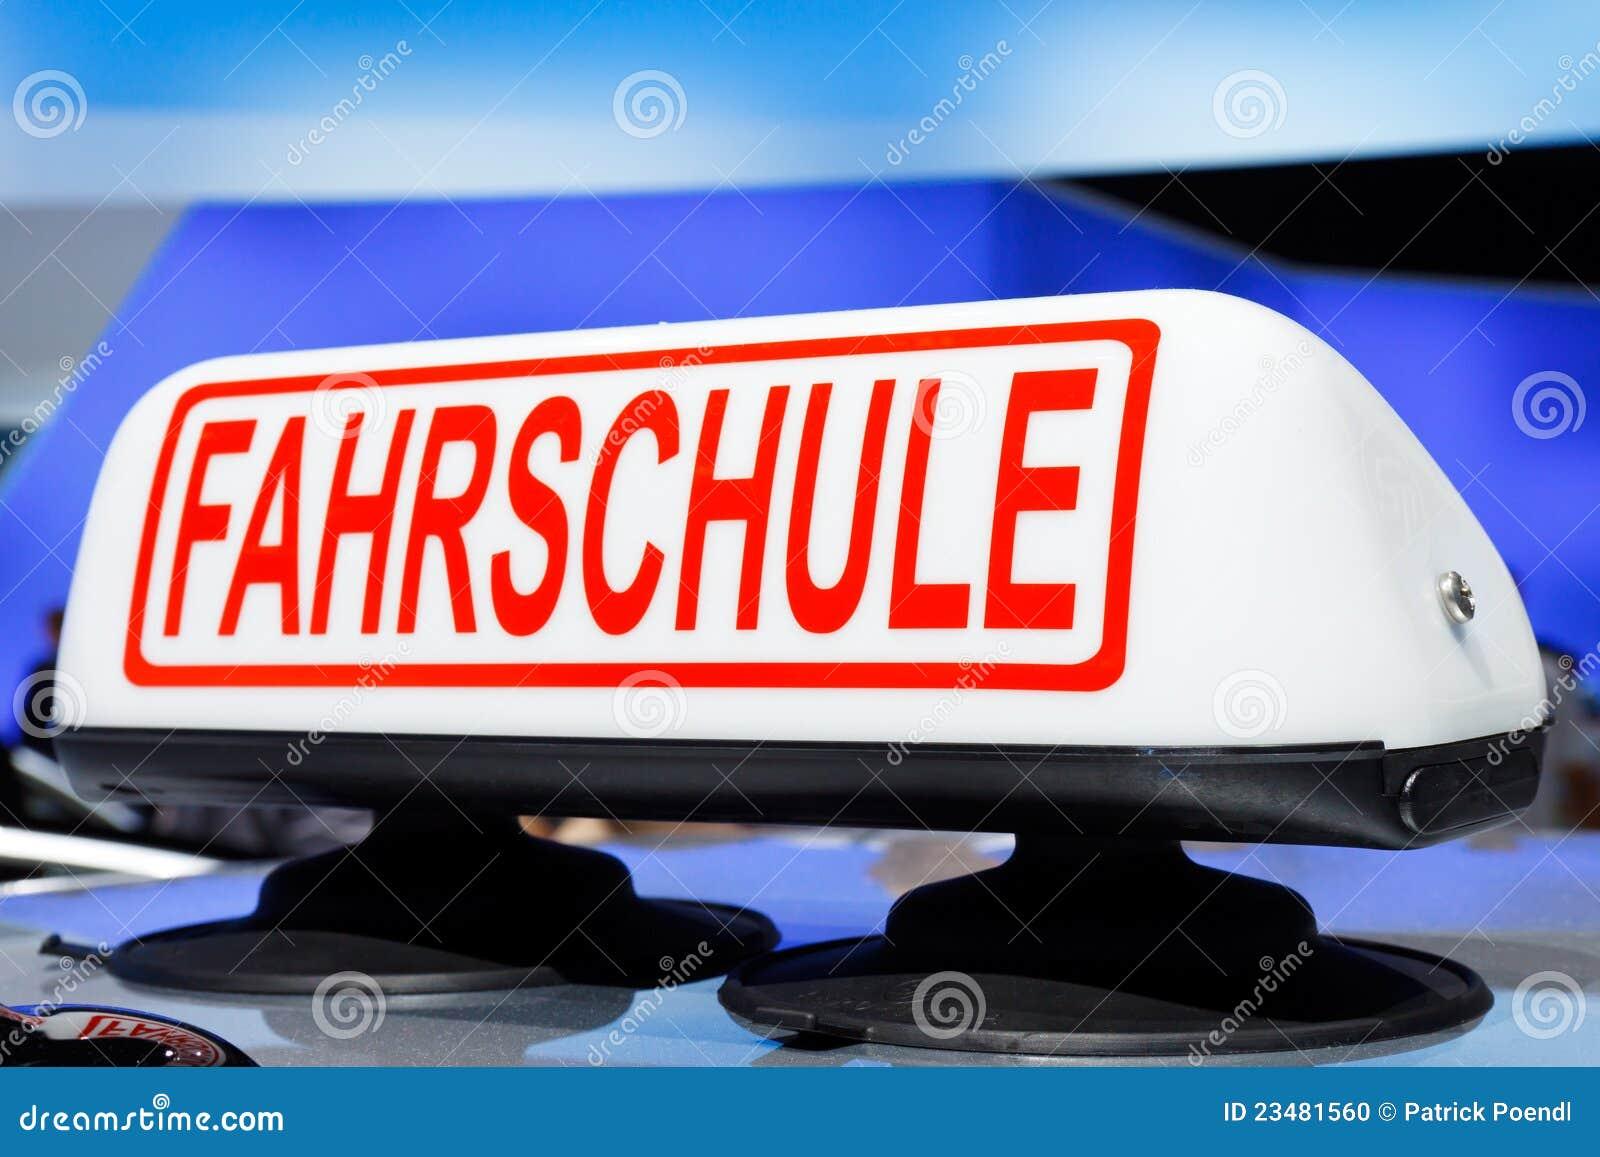 Fahrschule (Driving School) Sign